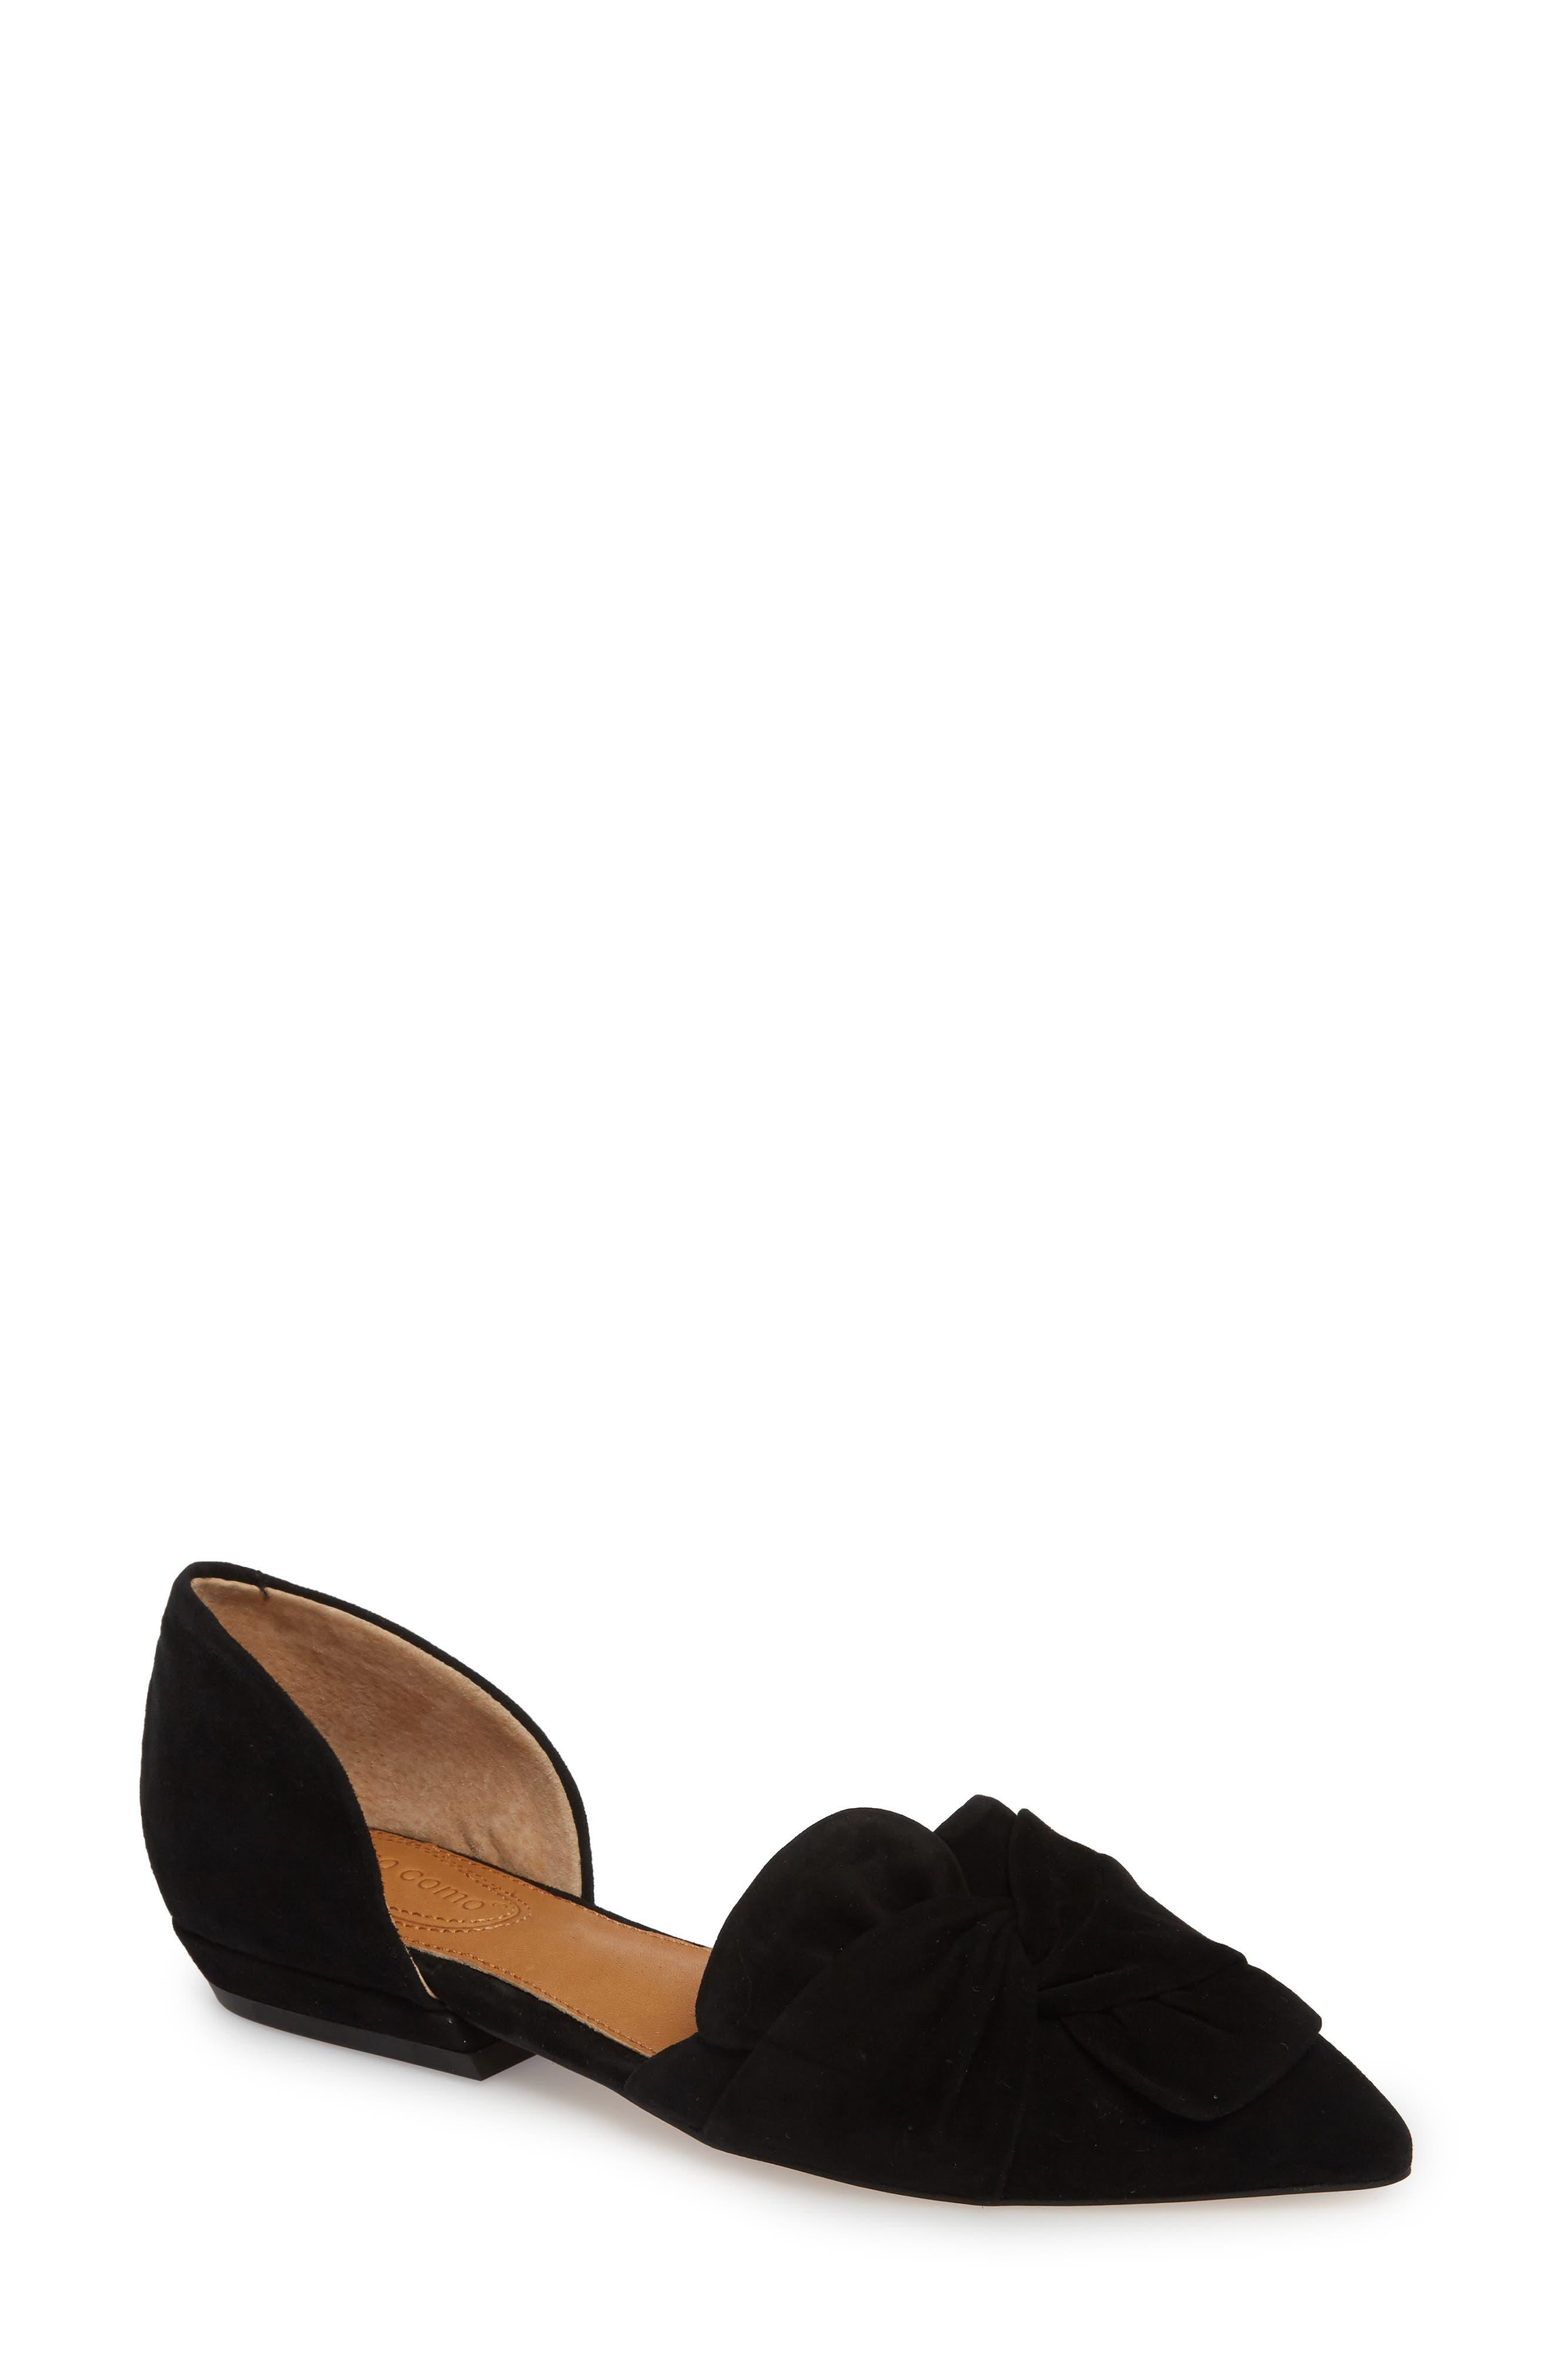 Mollie d'Orsay Flat,                         Main,                         color, BLACK SUEDE